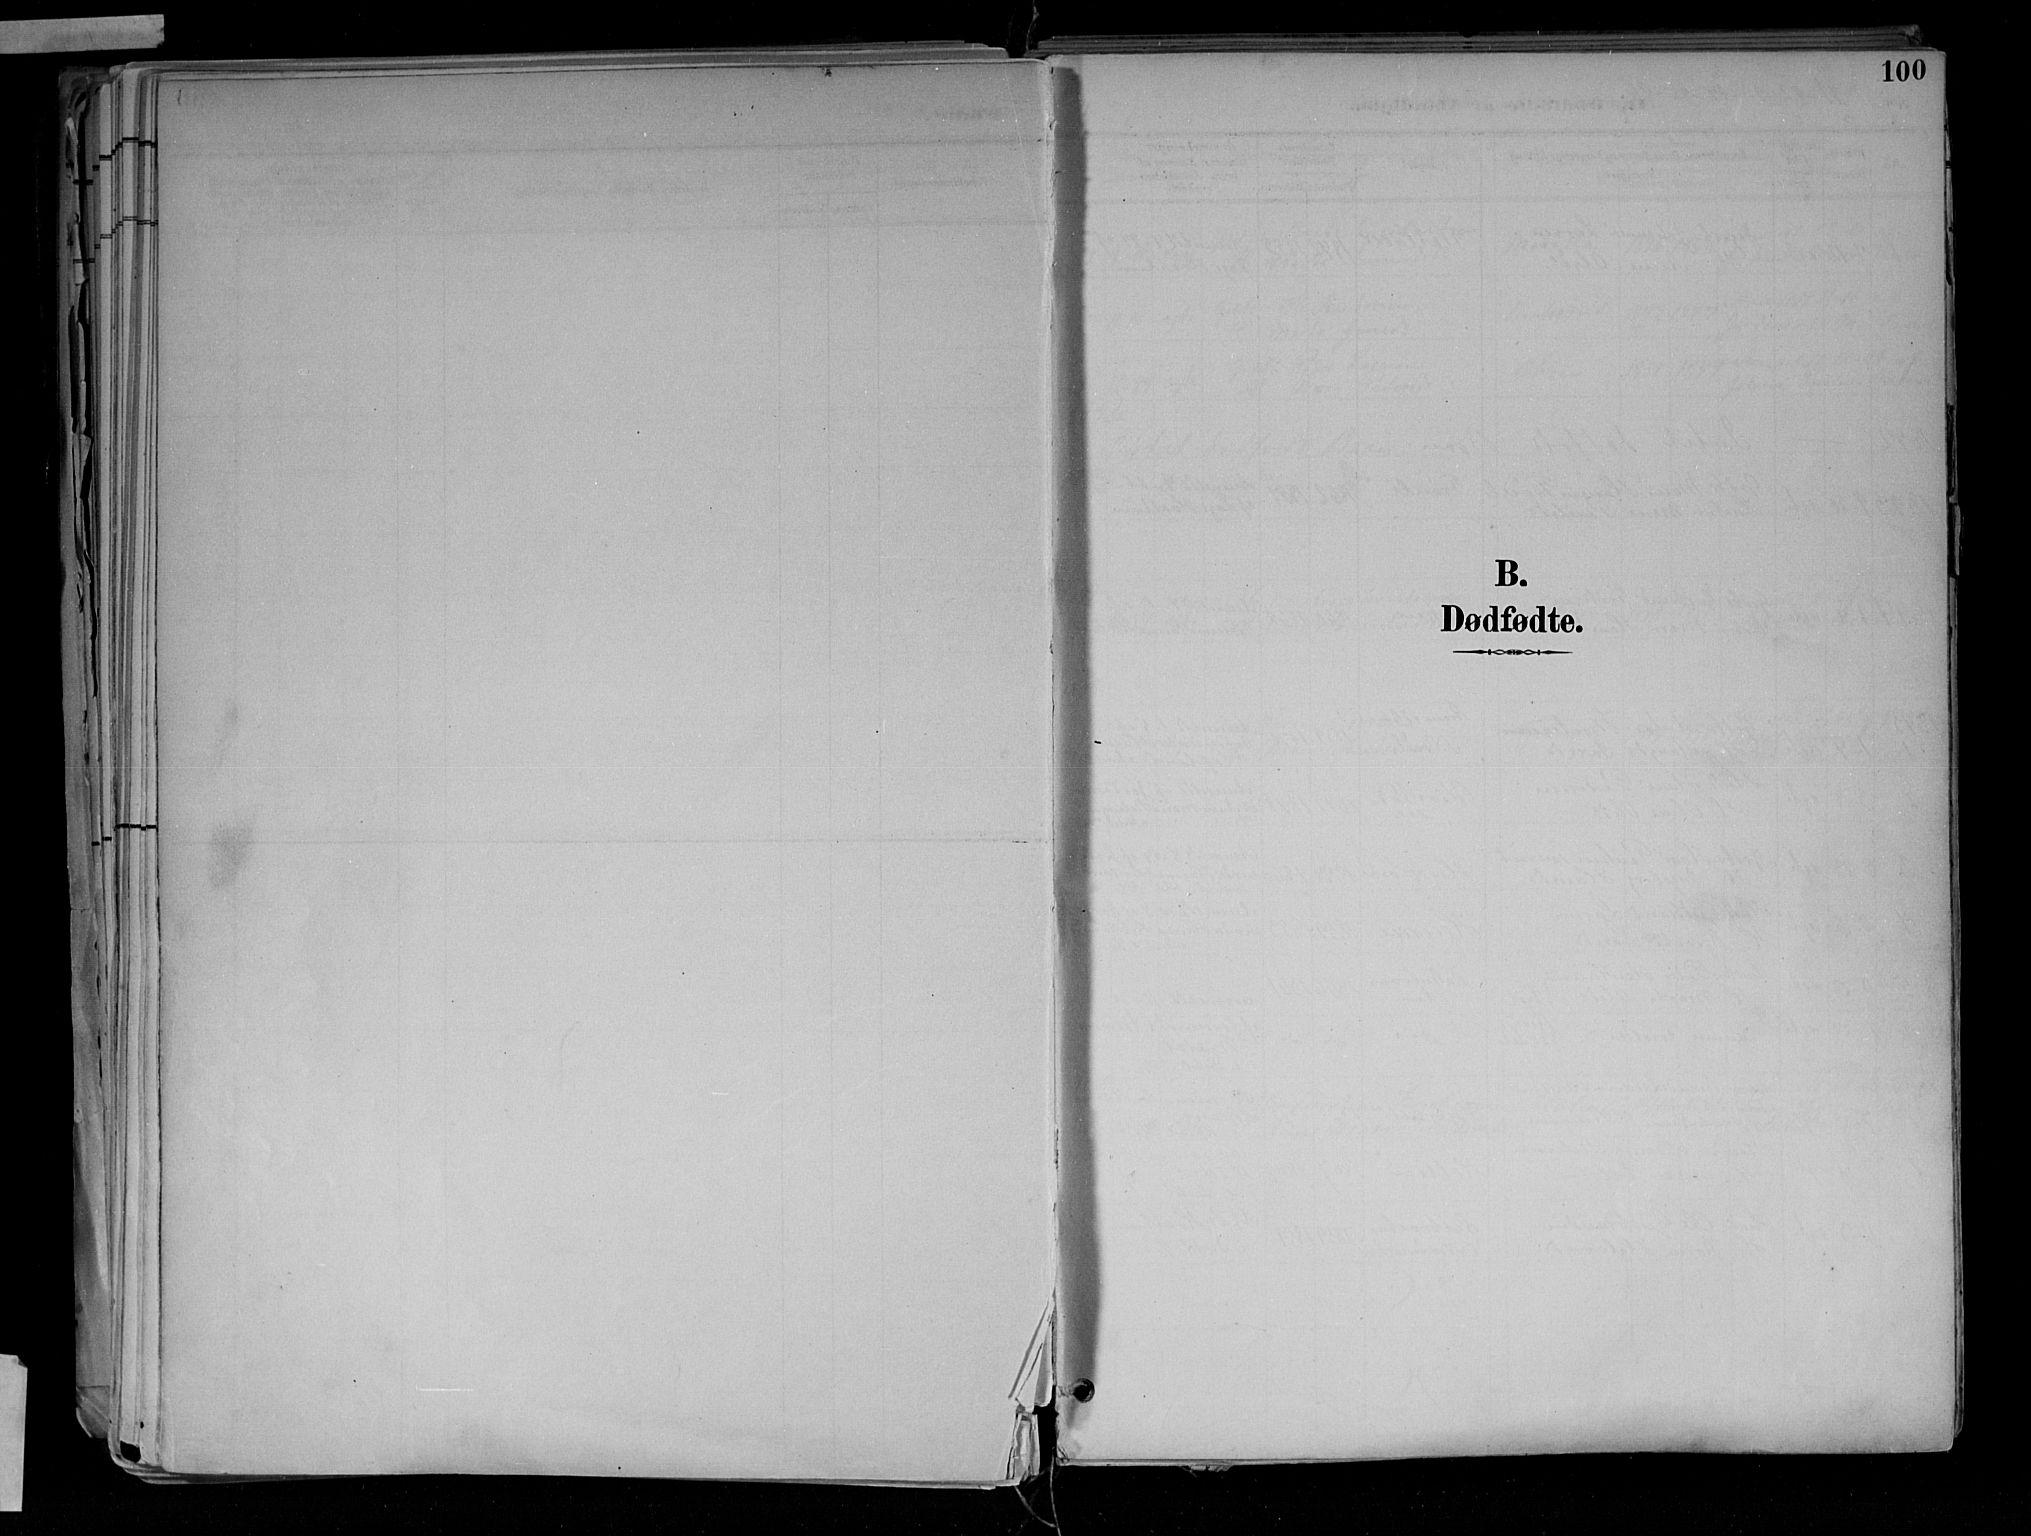 SAH, Jevnaker prestekontor, Ministerialbok nr. 10, 1891-1906, s. 100